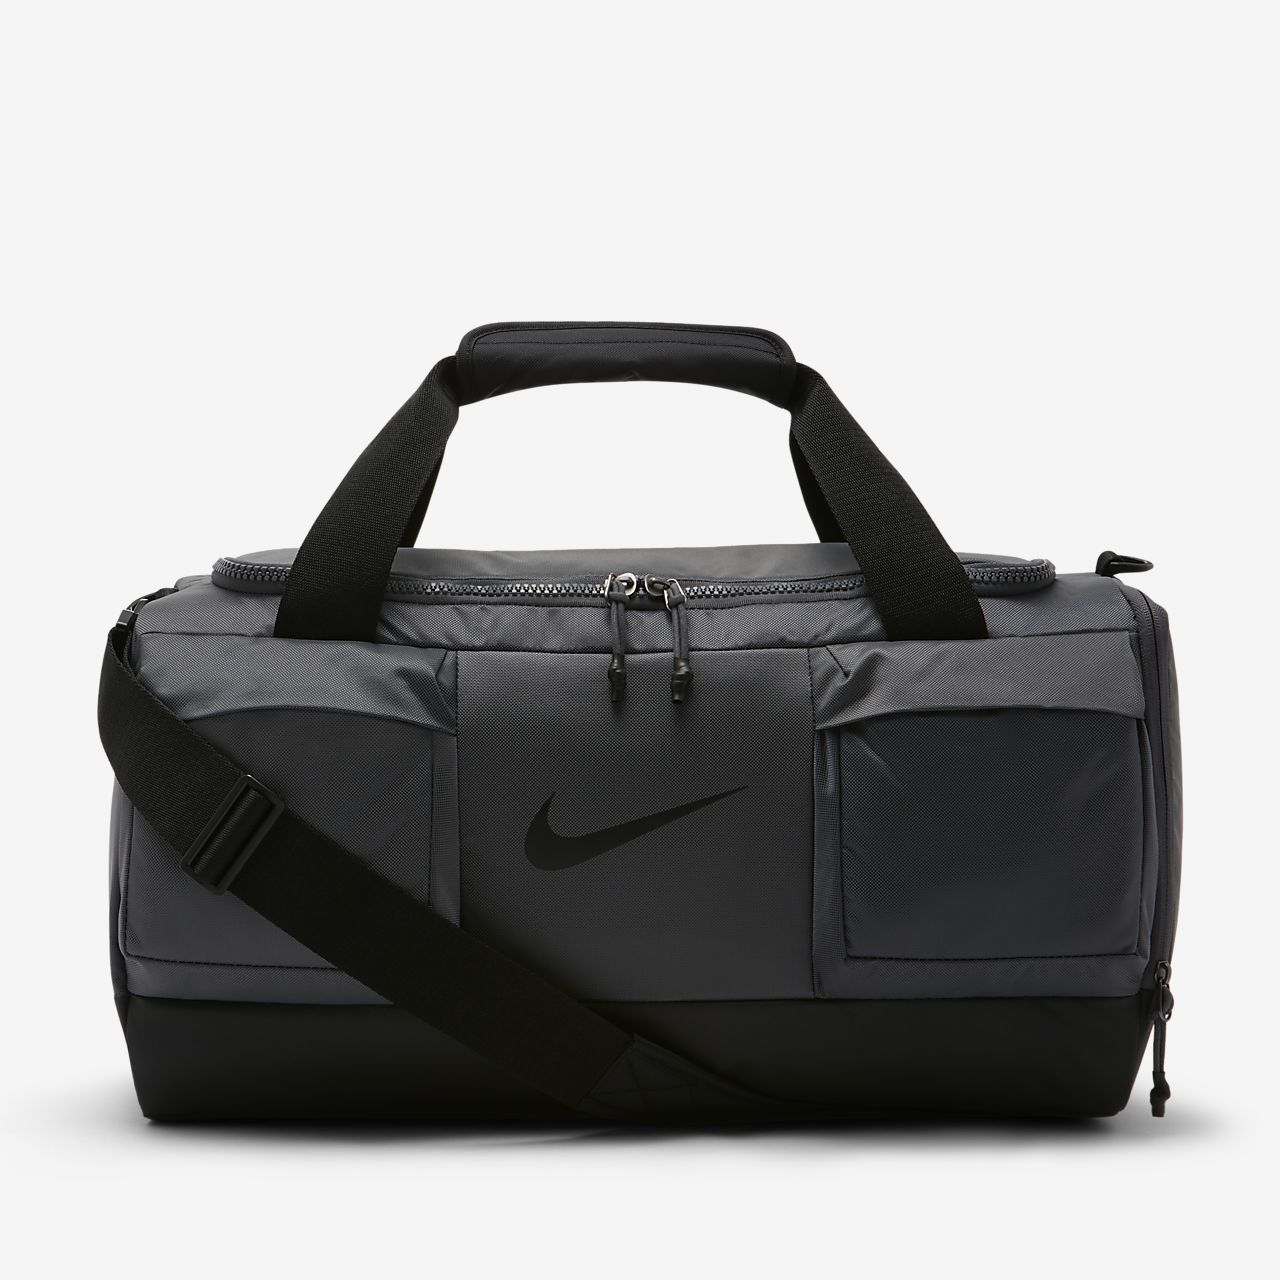 Мужская сумка-дафл для тренинга Nike Vapor Power (маленький размер)